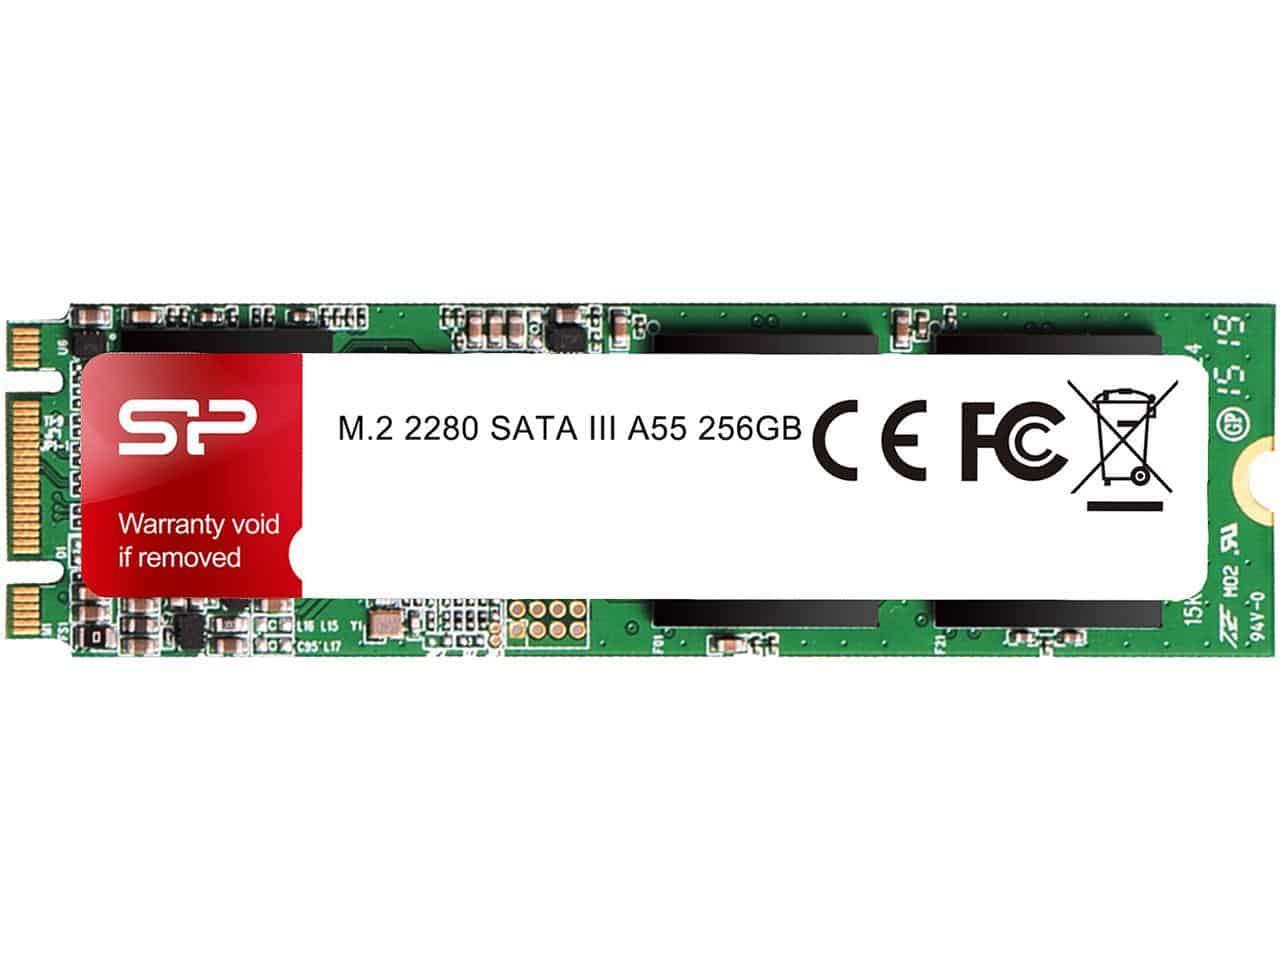 SILICON POWER P34A60 M.2 2280 256GB SSD